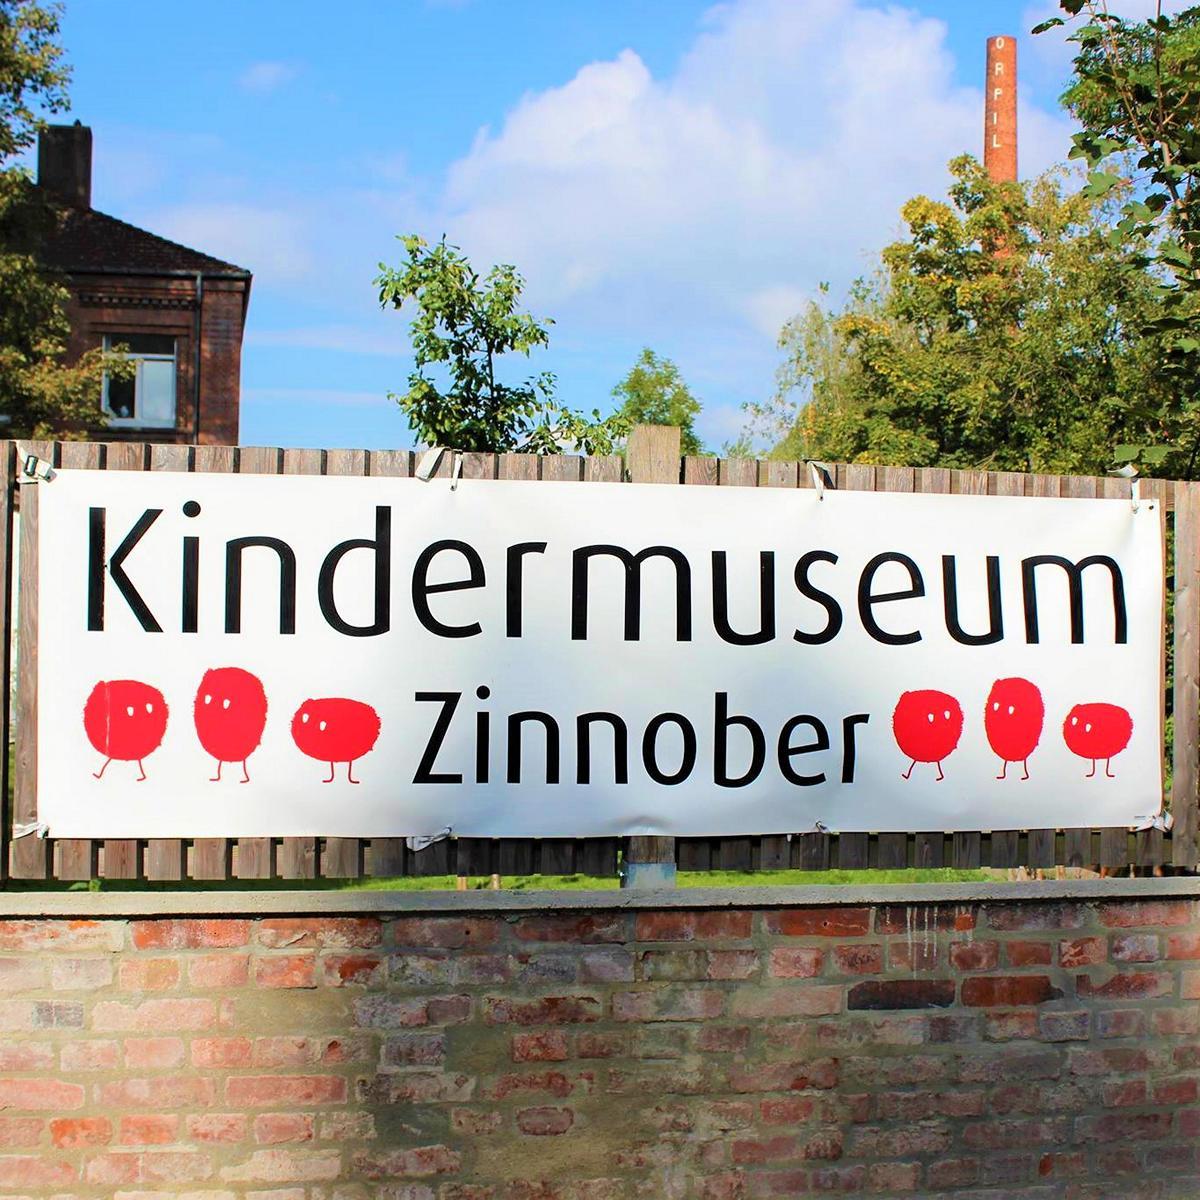 style hannover kindermuseum Zinnober INSTA - Kindermuseum Zinnober - Spendenaufruf